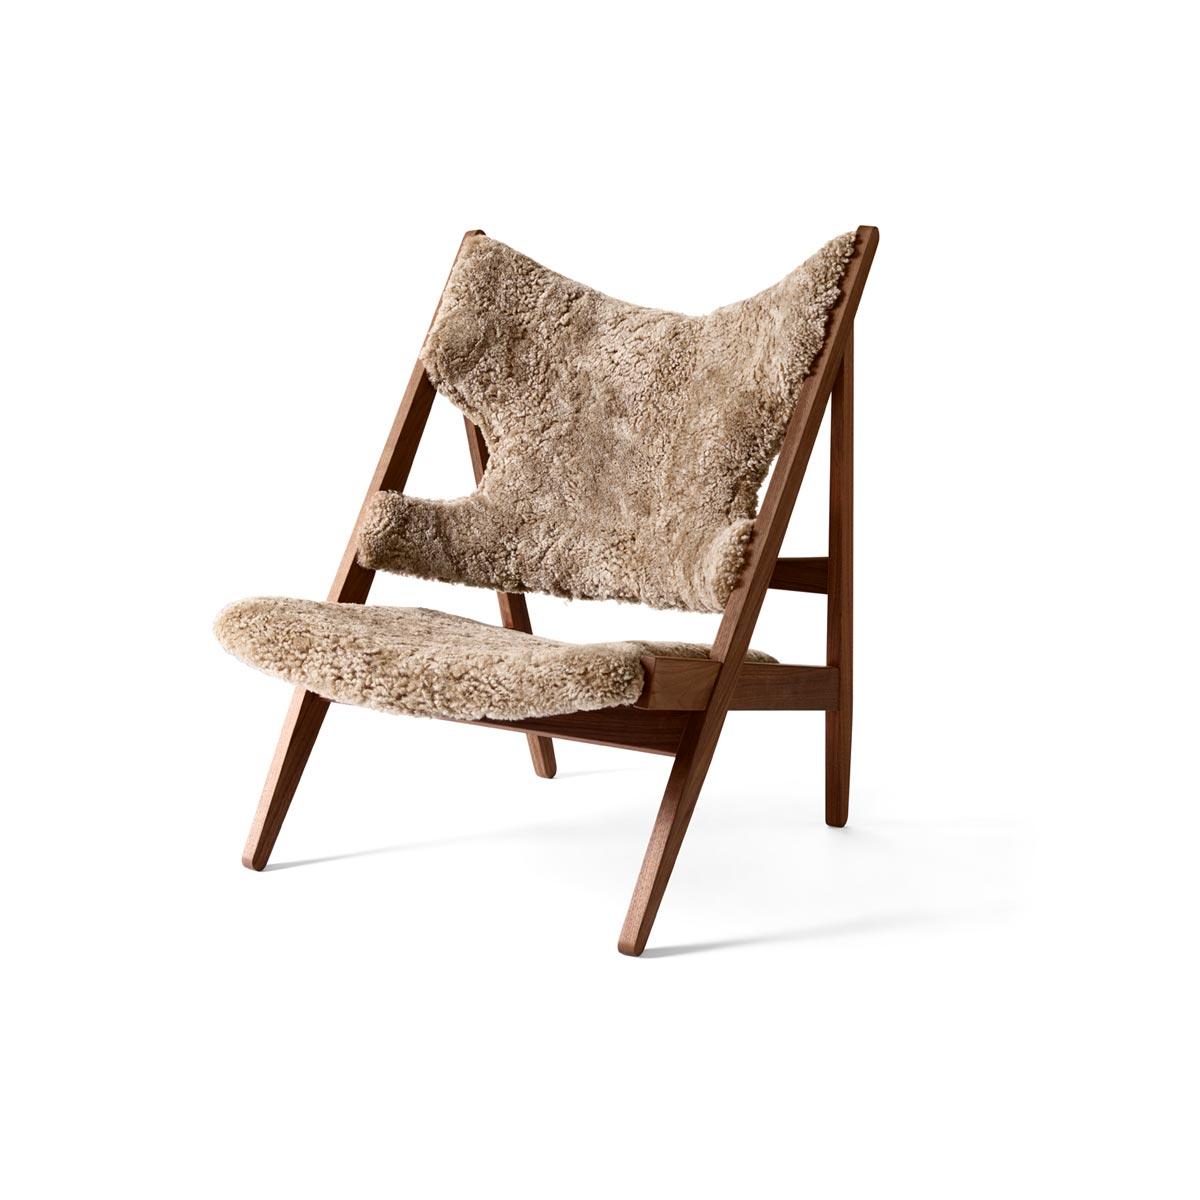 9682919 Knitting Lounge Chair Walnut Cork 19 Angle 1